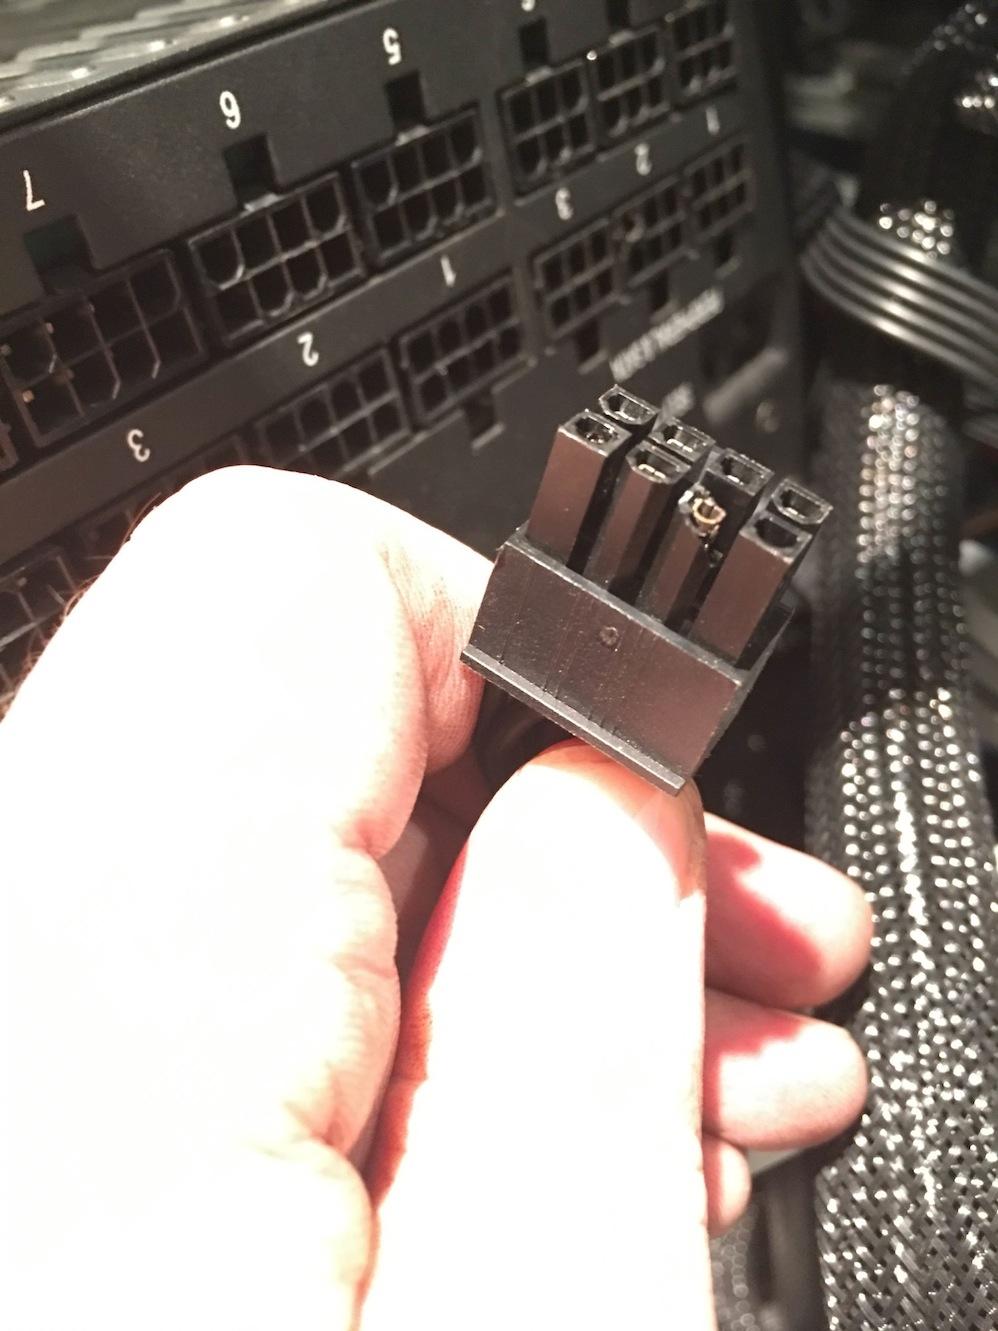 Using An Asrock H81 Pro Btc Board Beware Ethereum Community Forum Motherboard Img 7999